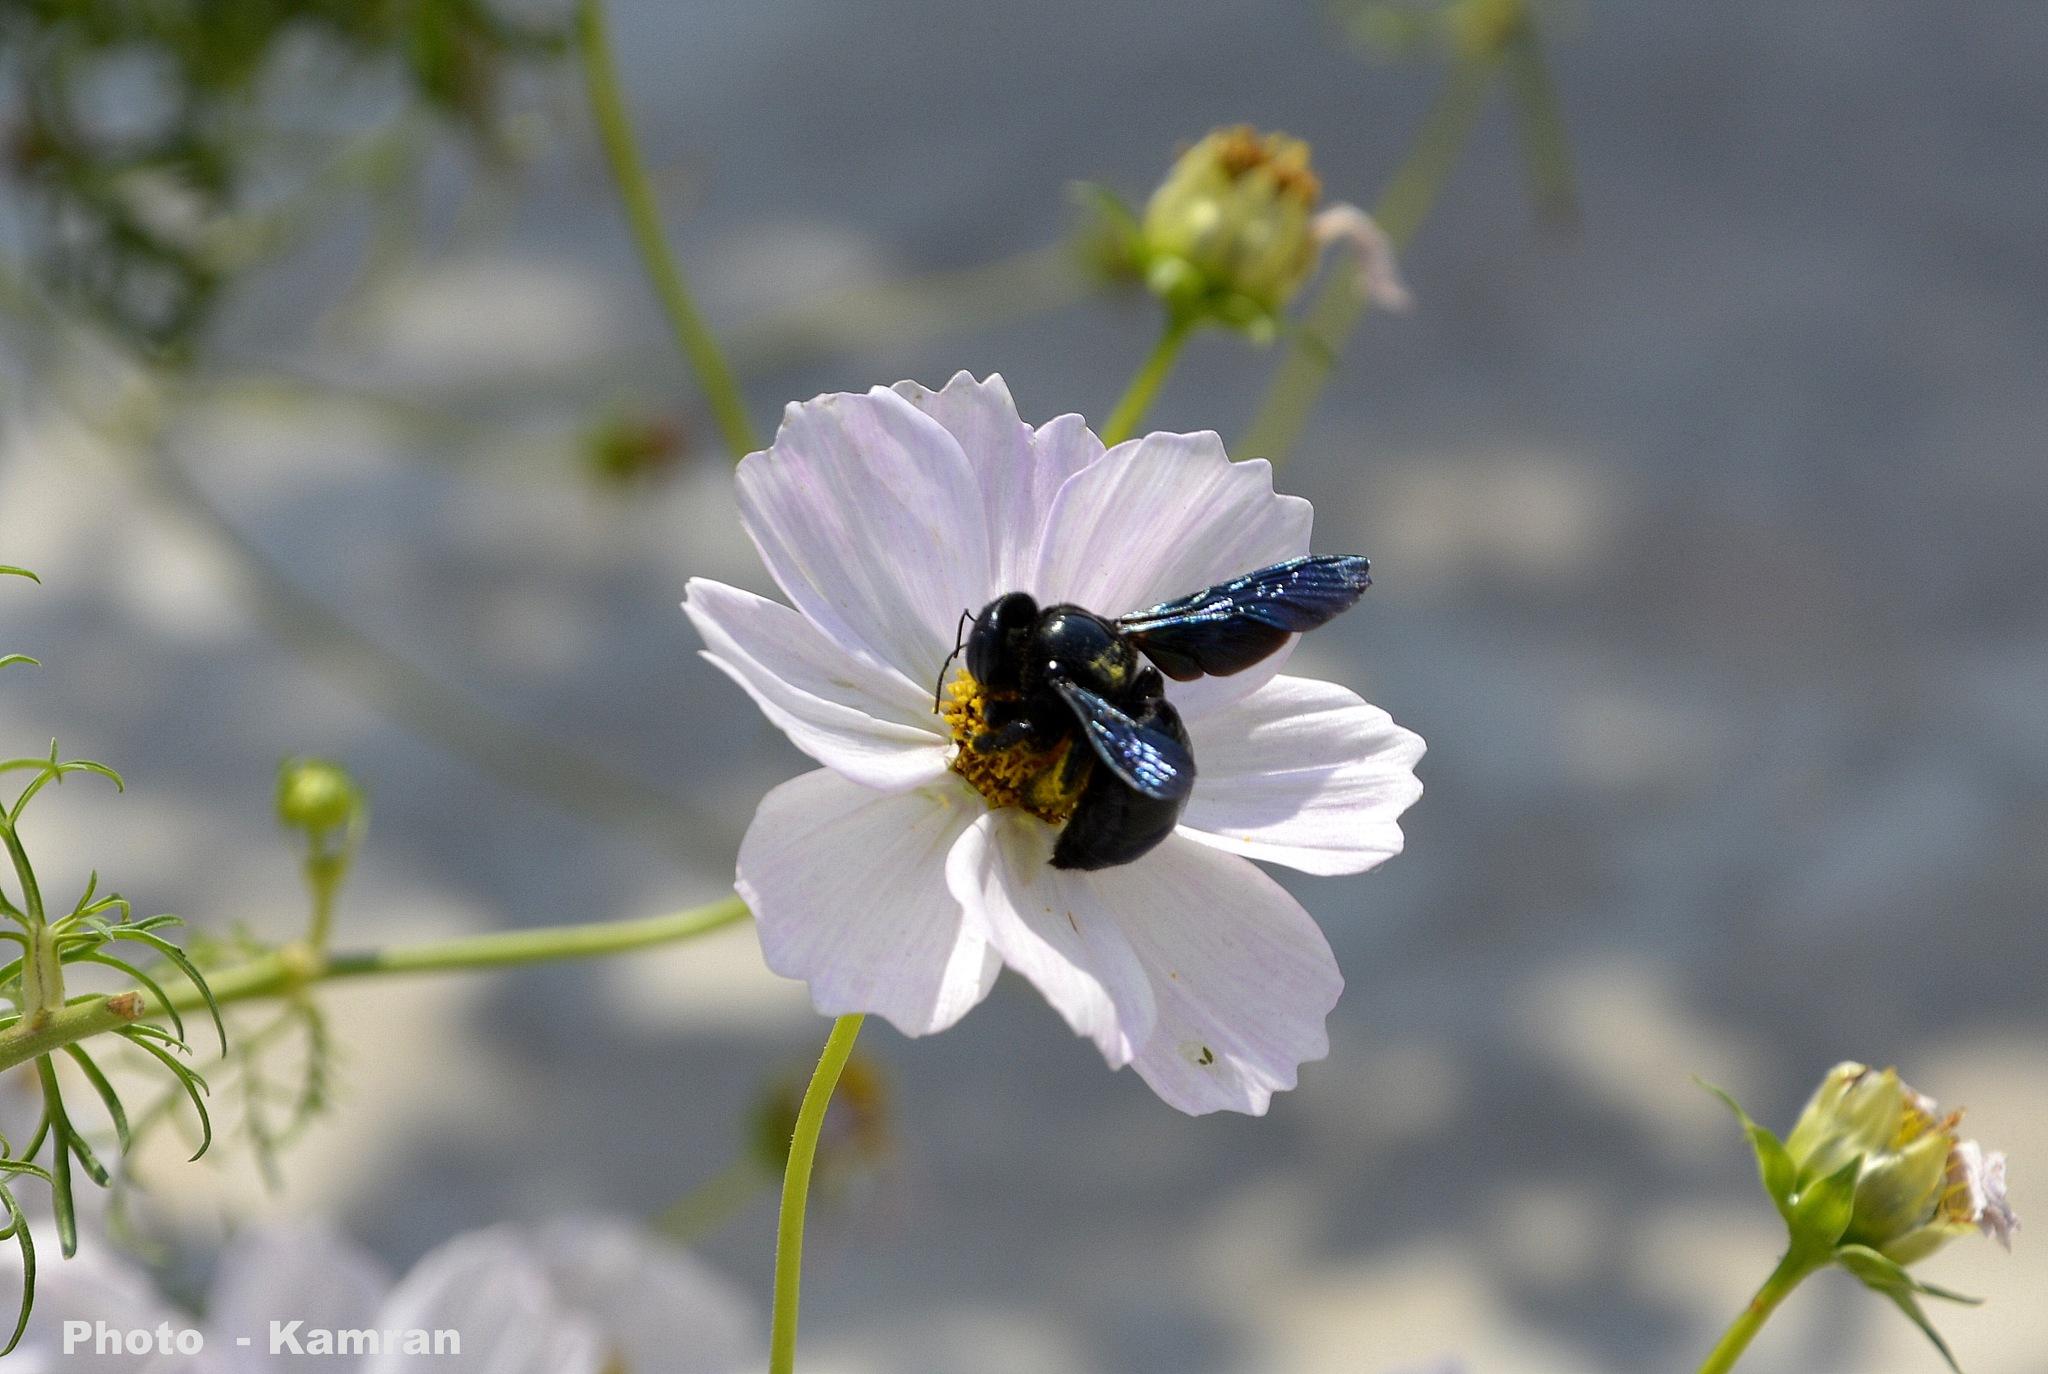 Black bee by kamran